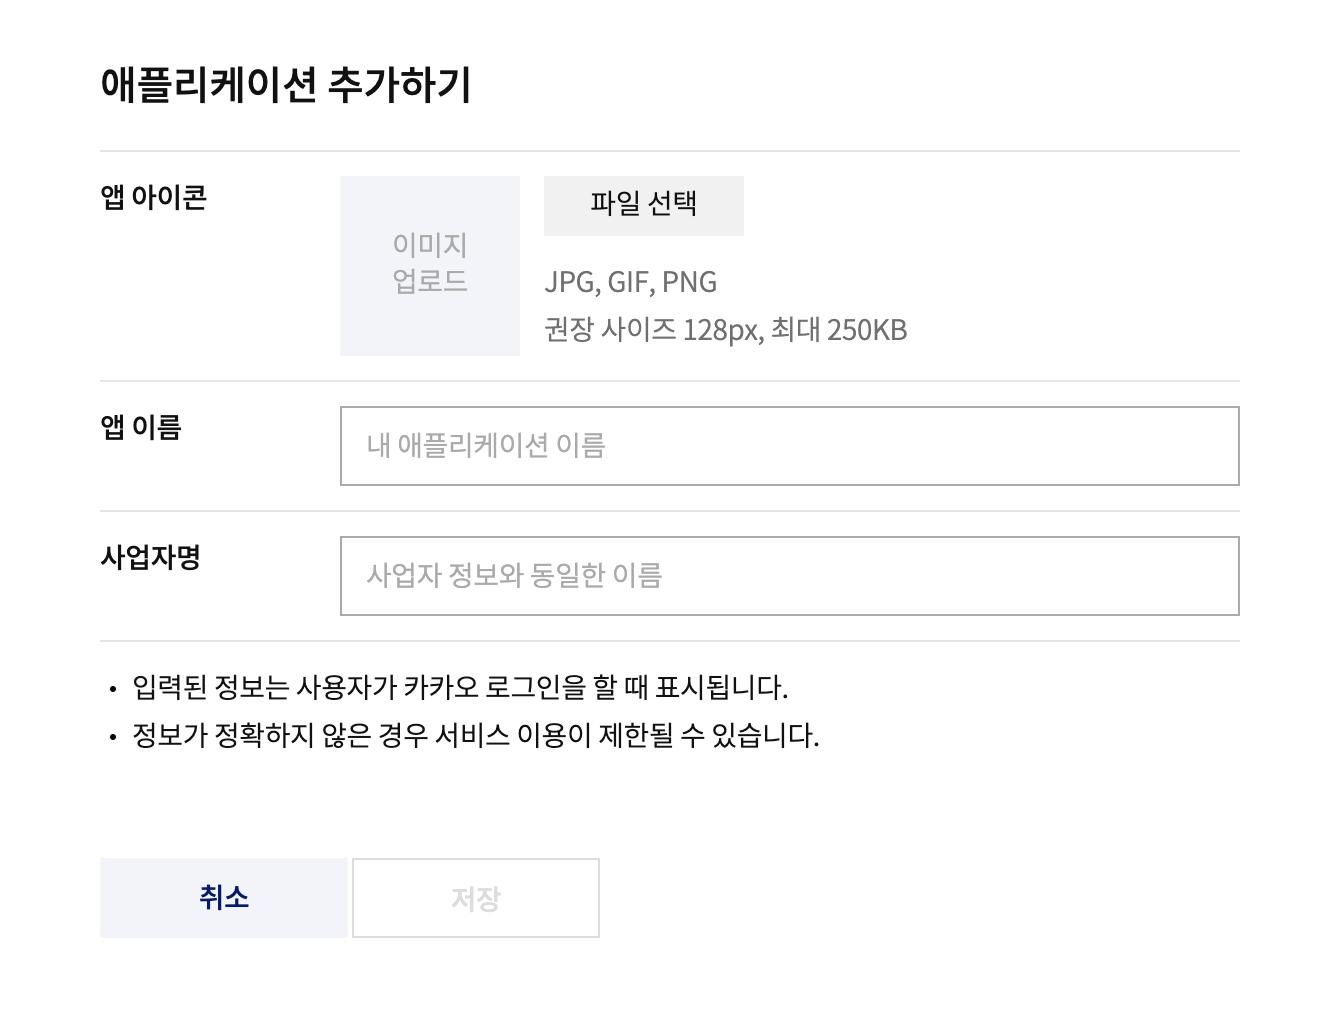 react custom hooks / kakao developer1 - snyung.com